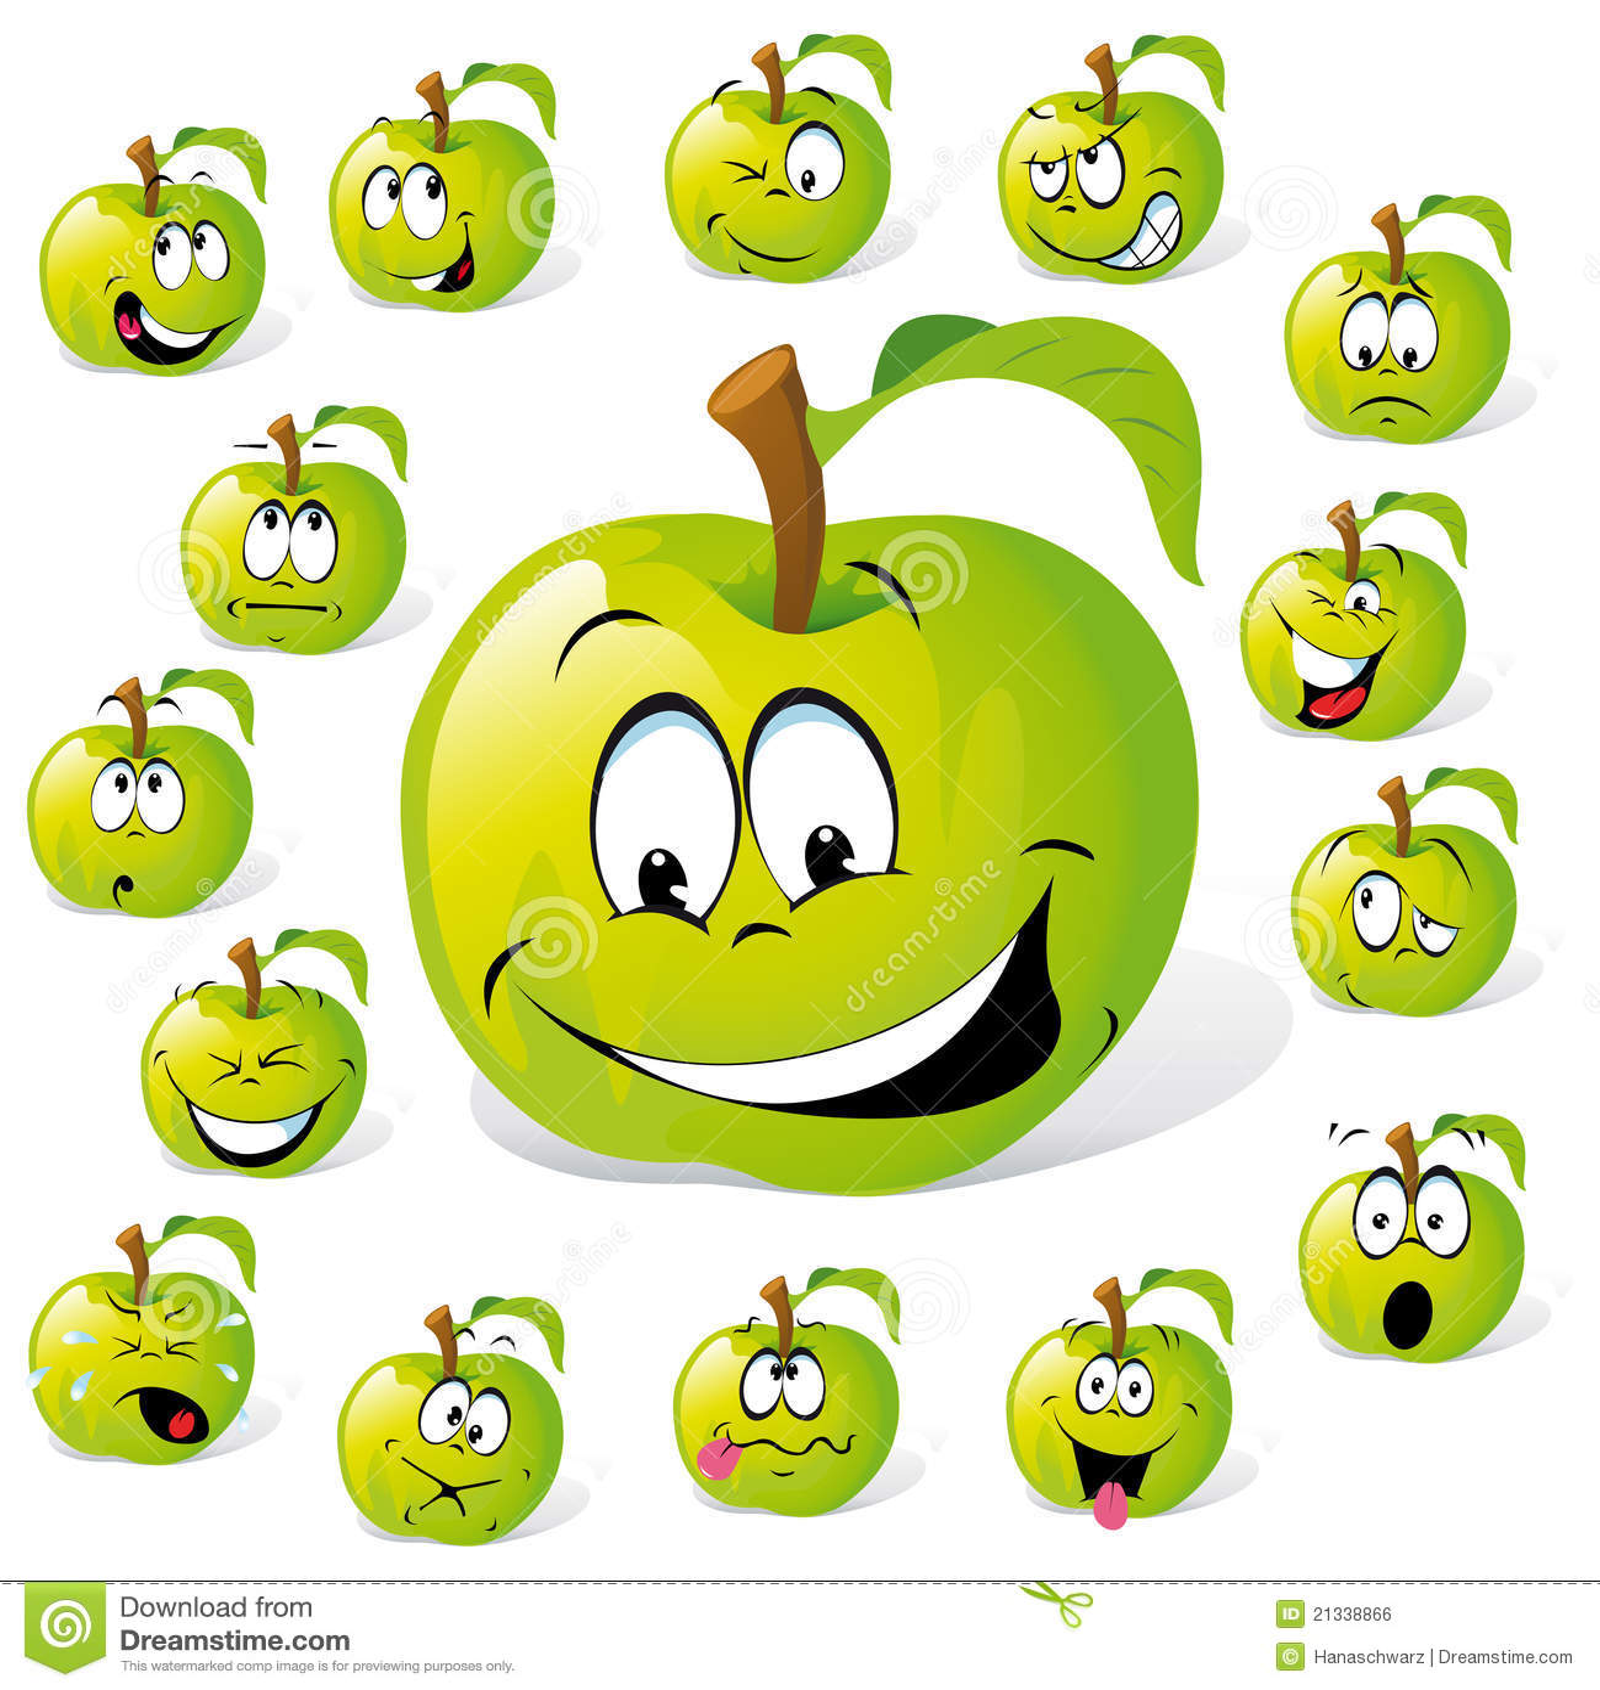 green apple cartoon royalty free stock image image 21338866 Banana Clip Art Black and White Banana Outline